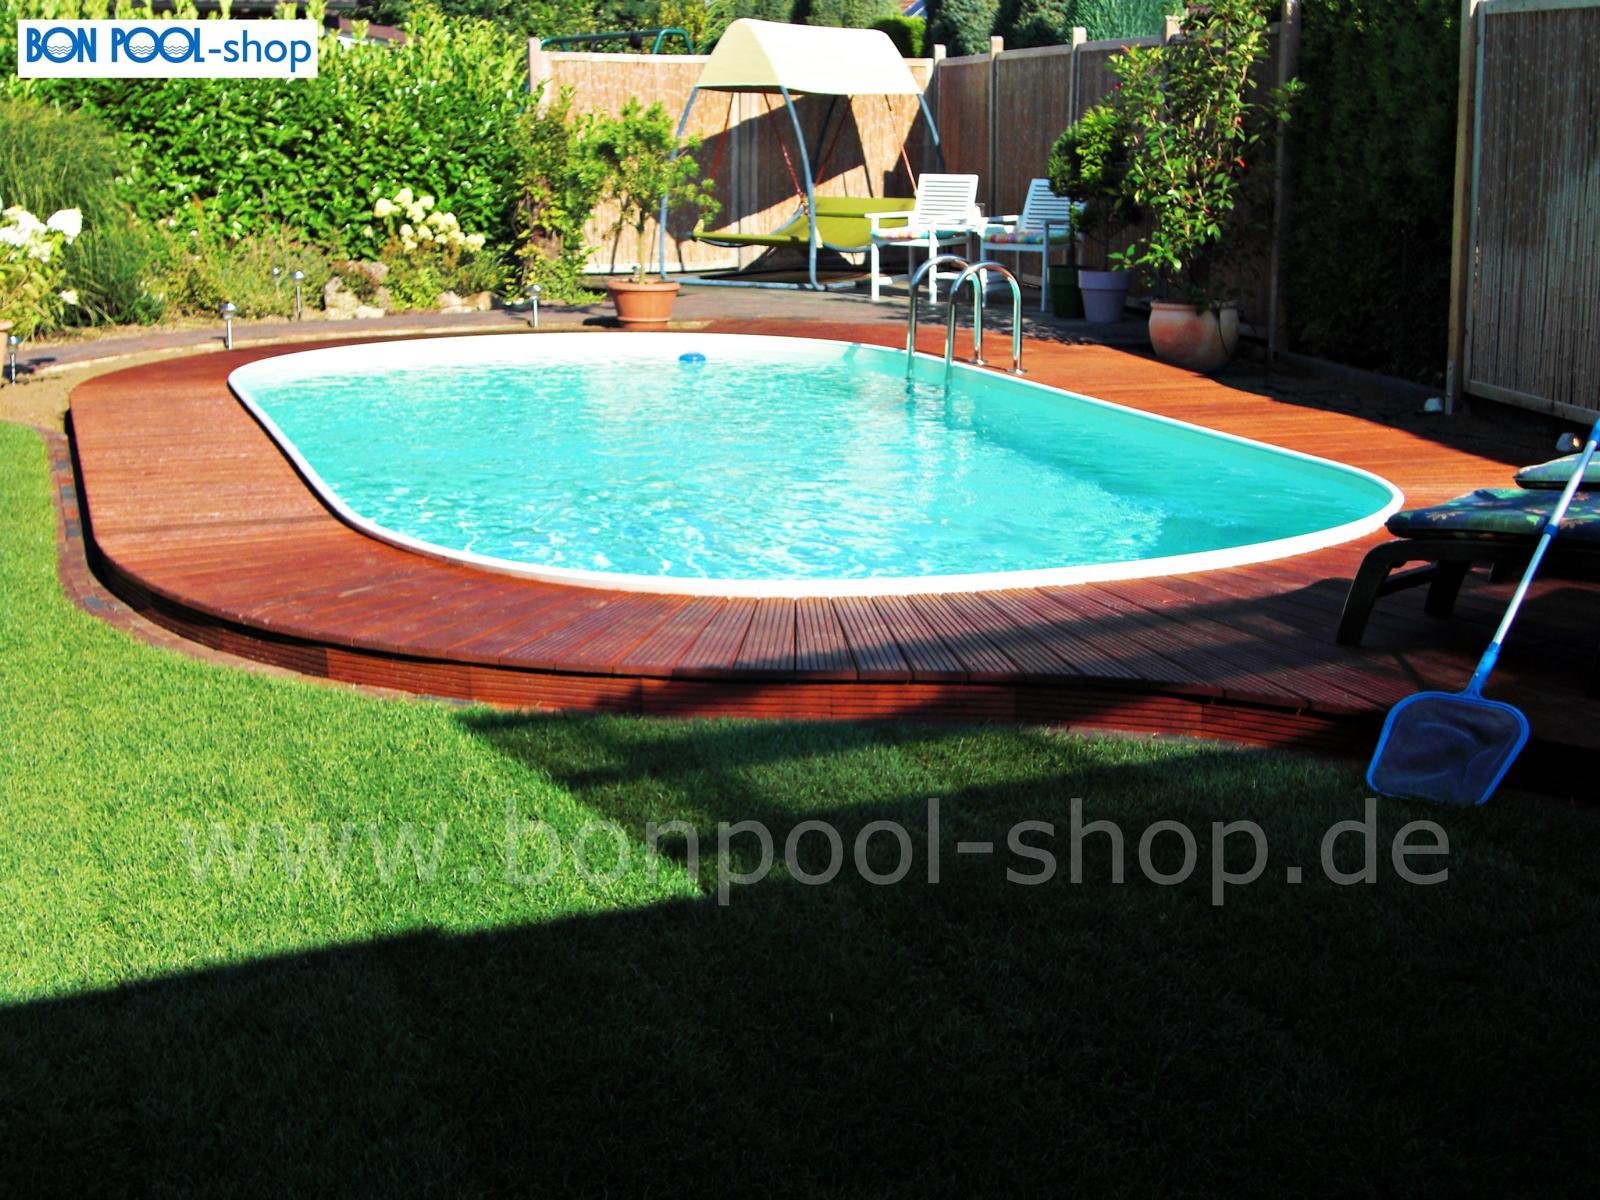 ovalbecken set 737 x 360 tiefe 150 bon pool